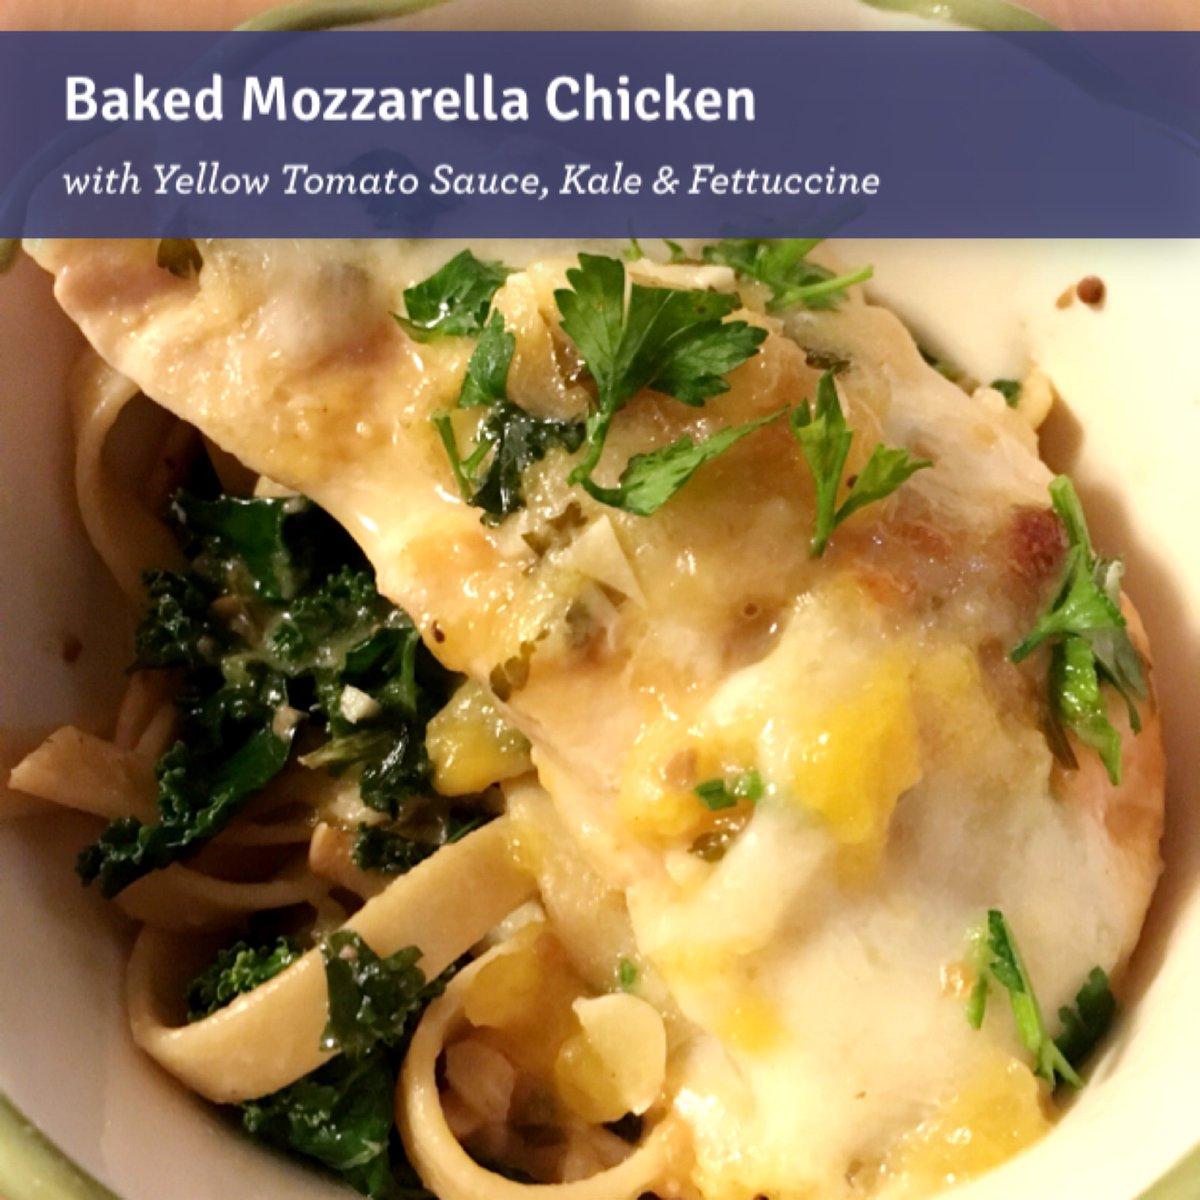 Blue apron uae - Ruth Anne Yang On Twitter Baked Mozzarella Chicken With Yellow Tomato Sauce Kale Fettuccine Blueapron Https T Co Lb9zihhino